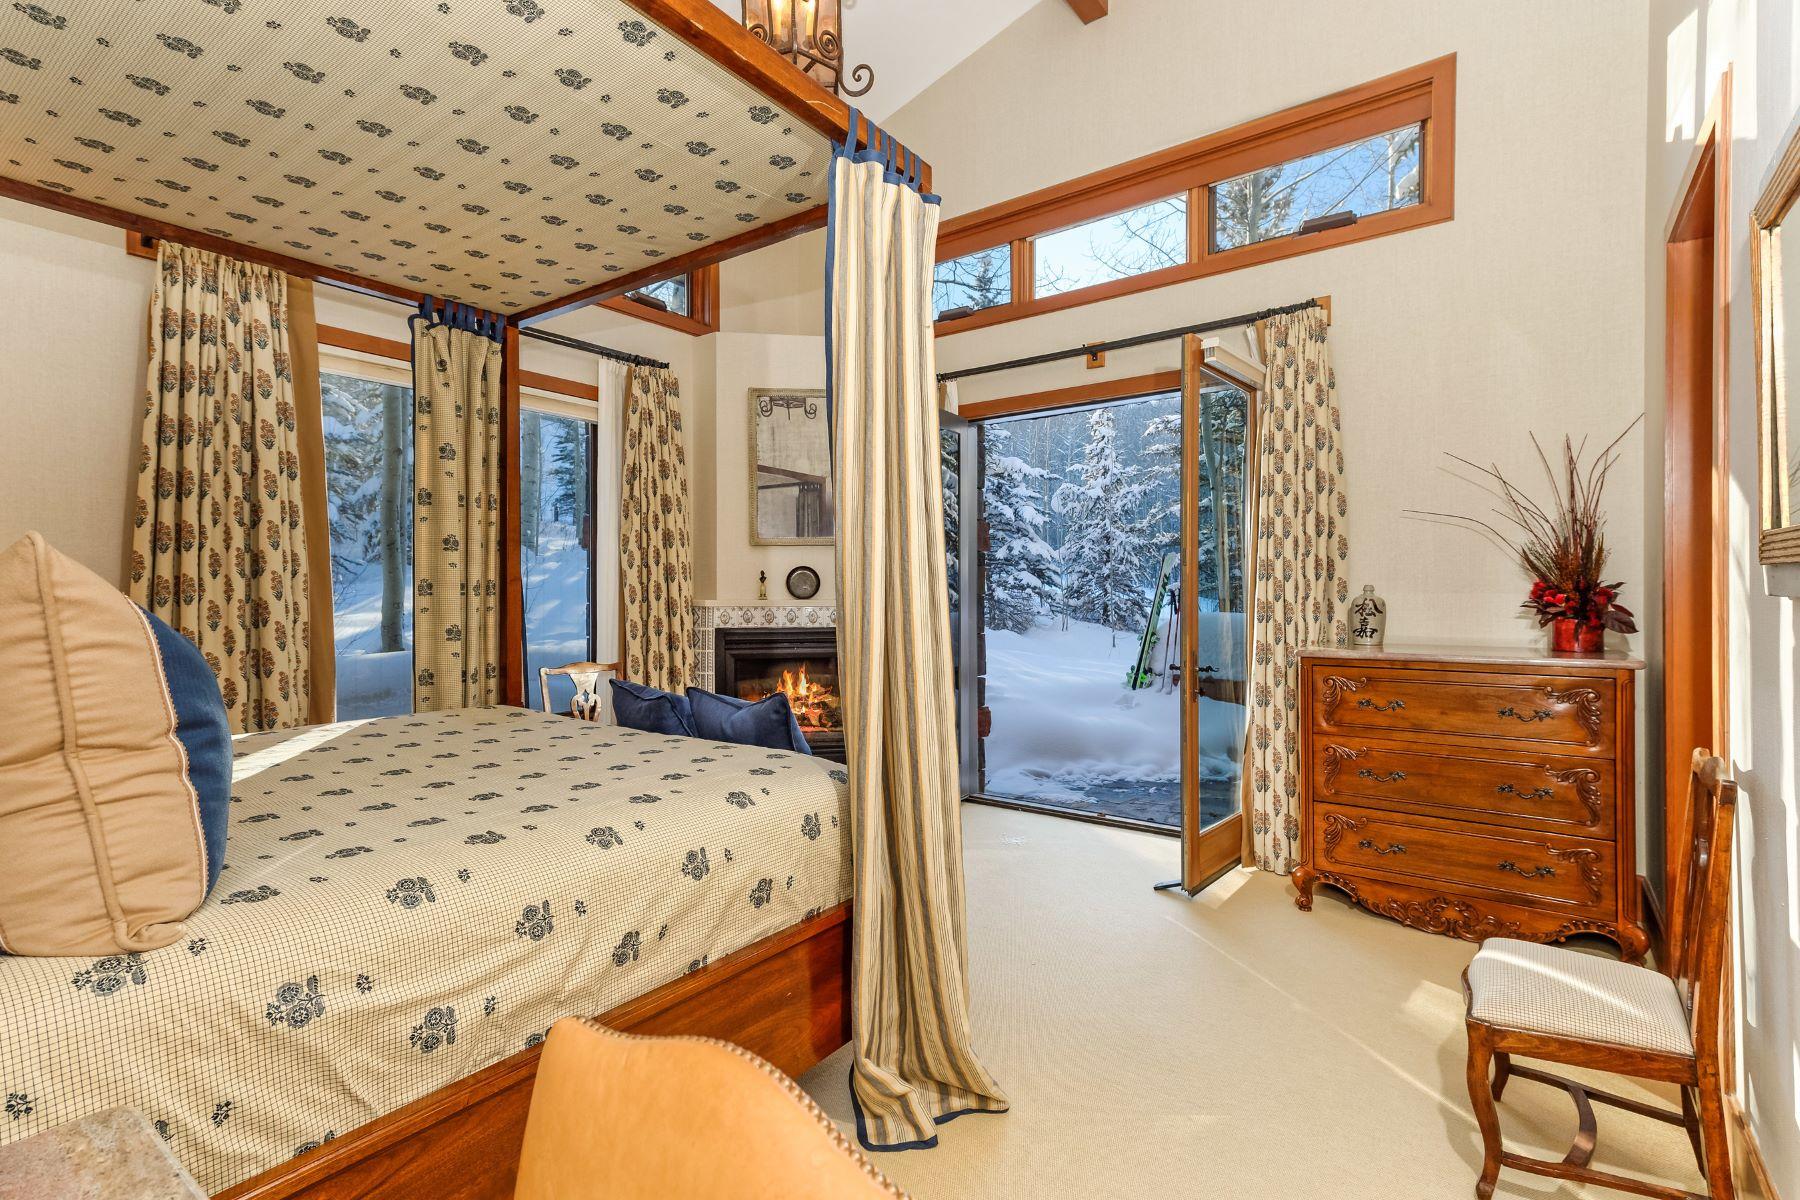 Additional photo for property listing at Slopeside Estate 183 E. Fork Lane Snowmass Village, Colorado 81615 United States